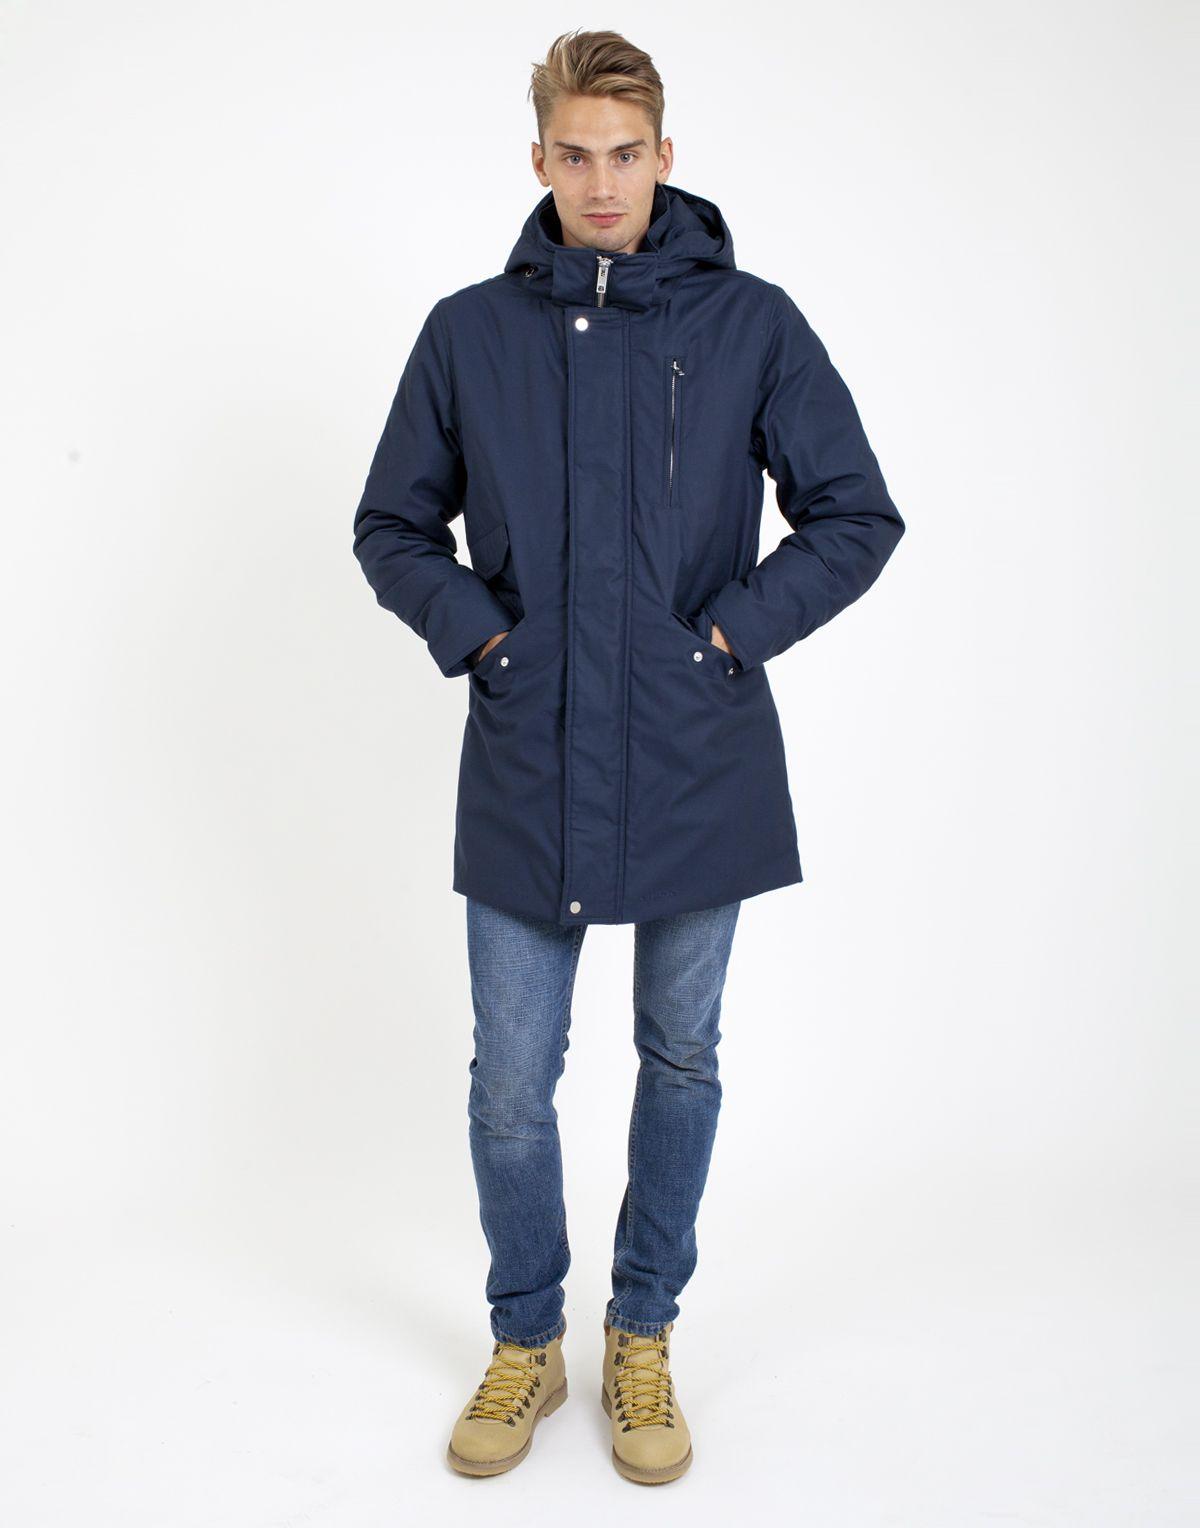 0a765d427a6b Elvine maximiliam dark navy | Wardrobe | Winter jackets, Jackets ...